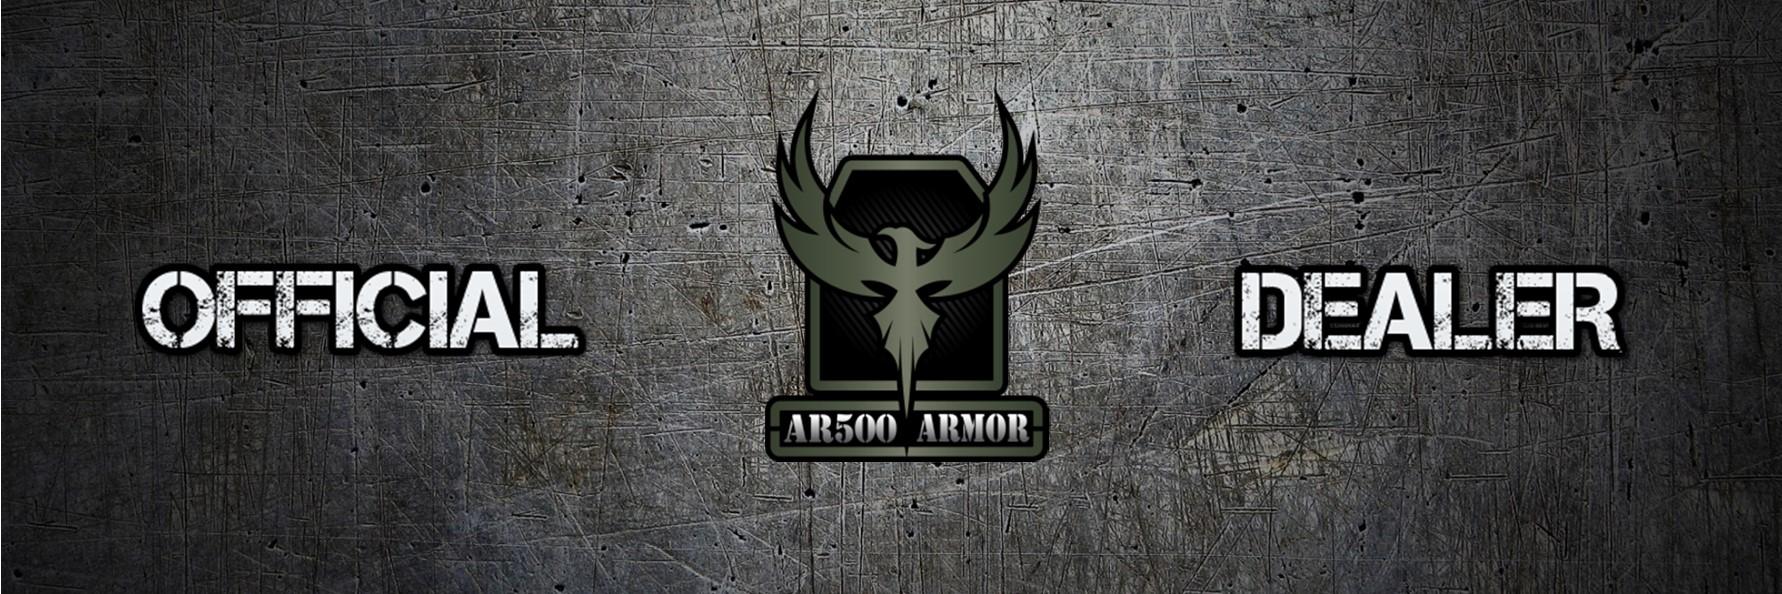 https://patriot-quartermaster-llc.ammoreadycloud.com/catalog/ar-500-armor/plate-carriers